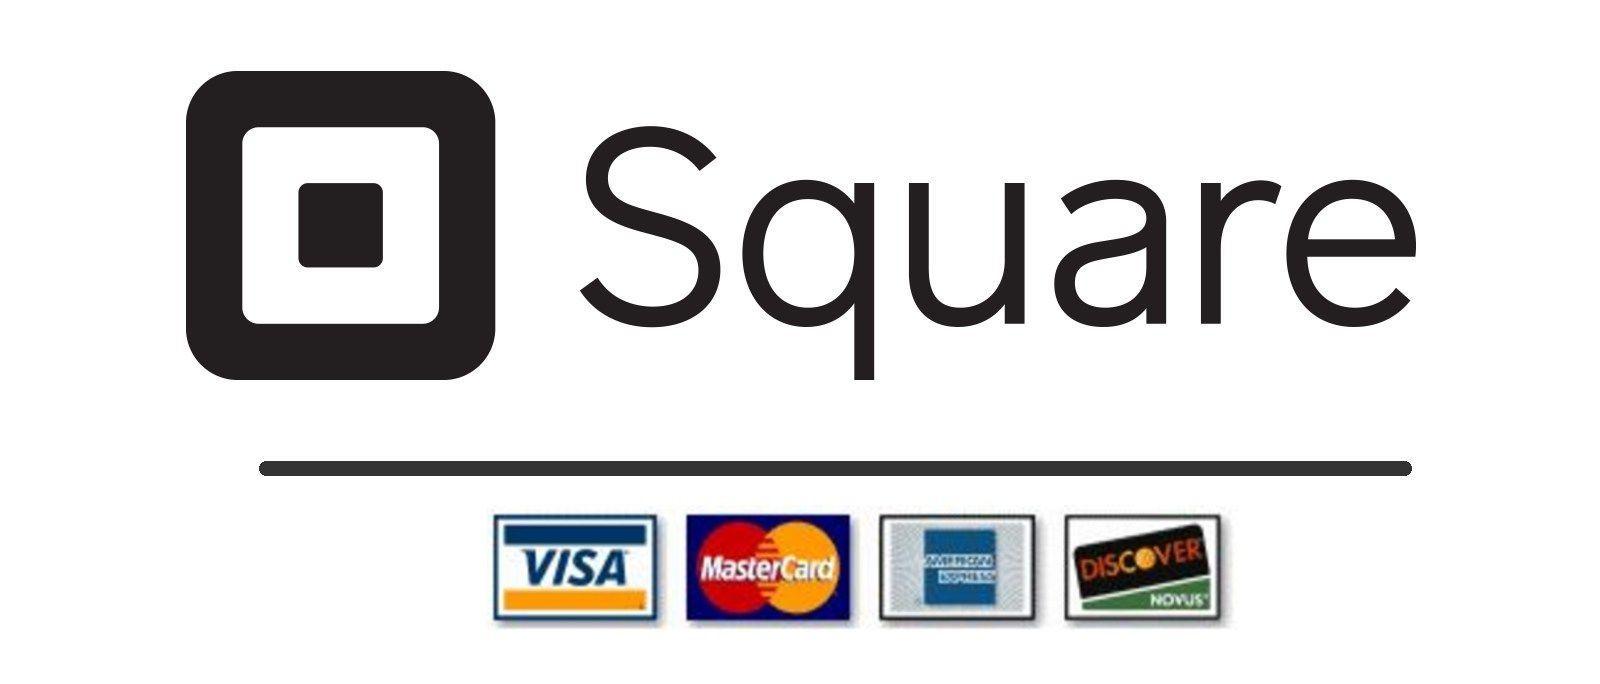 Square Credit Card Logo - LogoDix